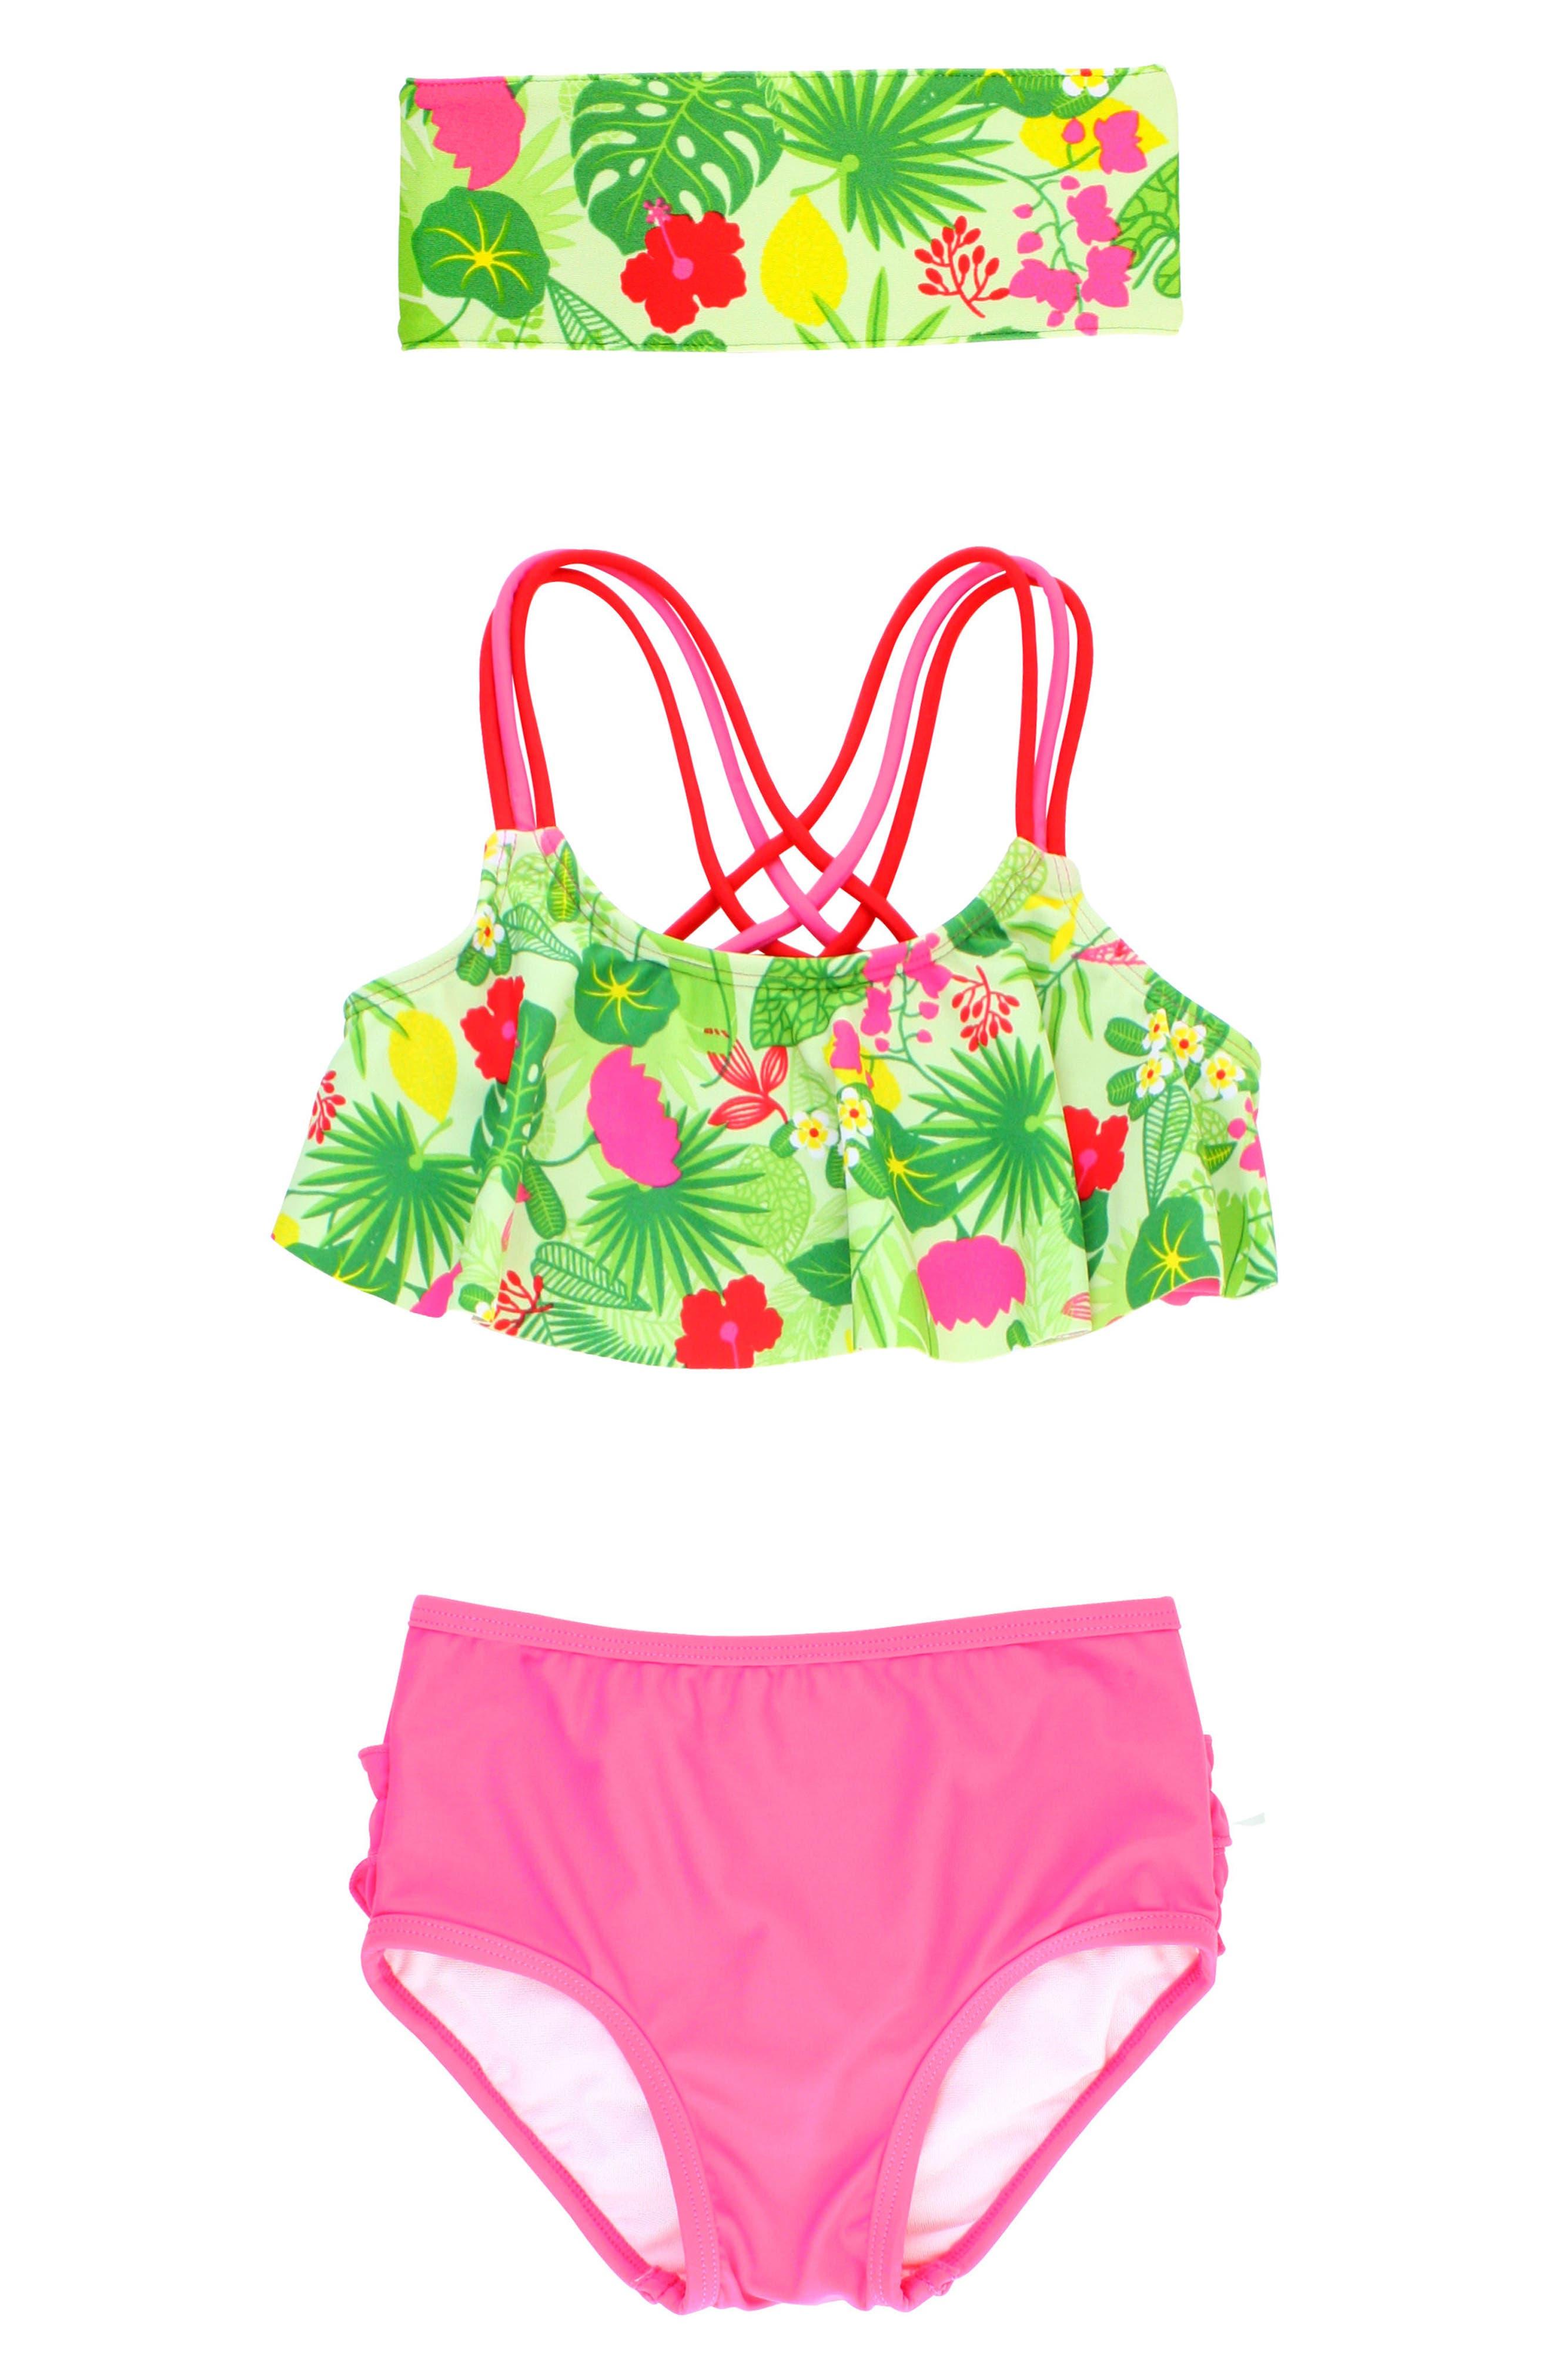 Main Image - RuffleButts Tropical Two-Piece Swimsuit & Headband Set (Toddler Girls)